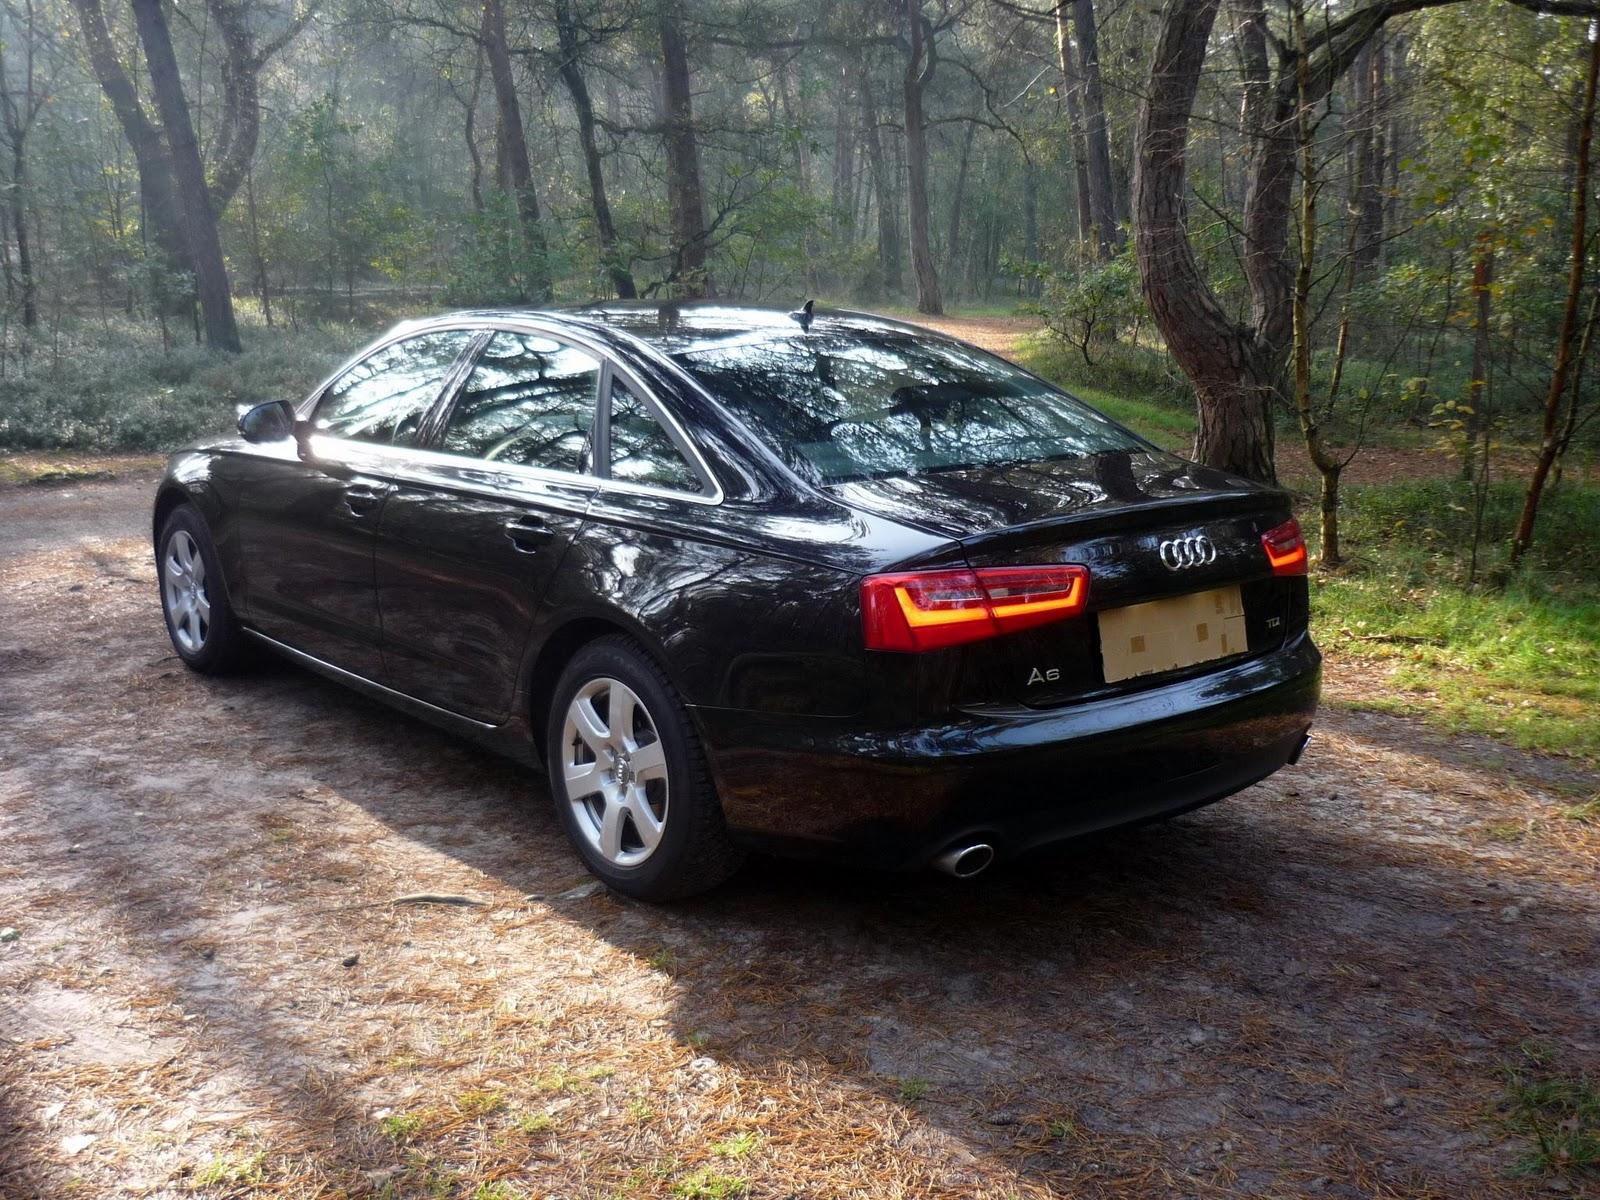 Bmw F11 Vs Audi A6 ✓ The Audi Car